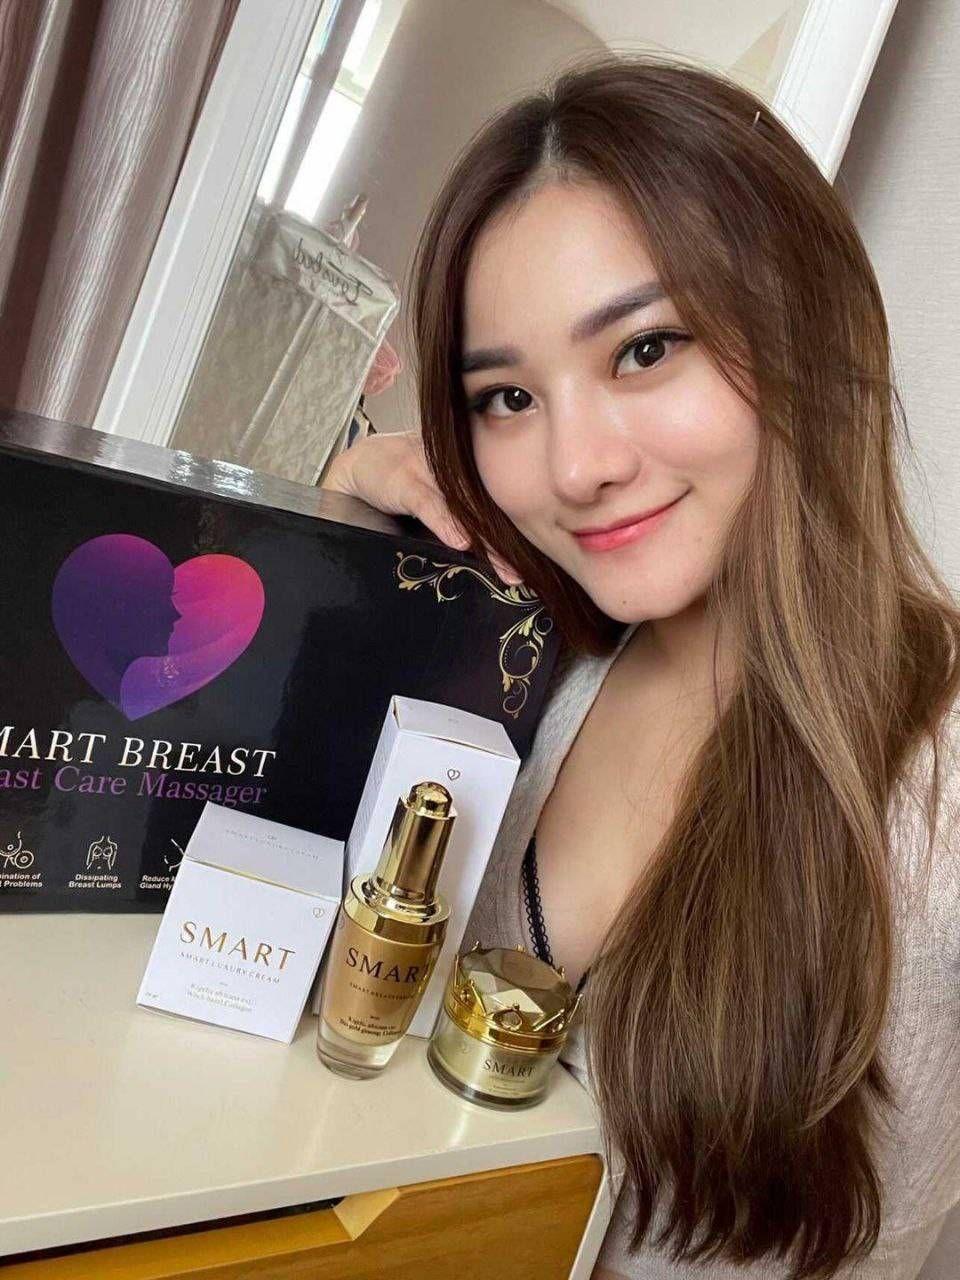 Smart Breast